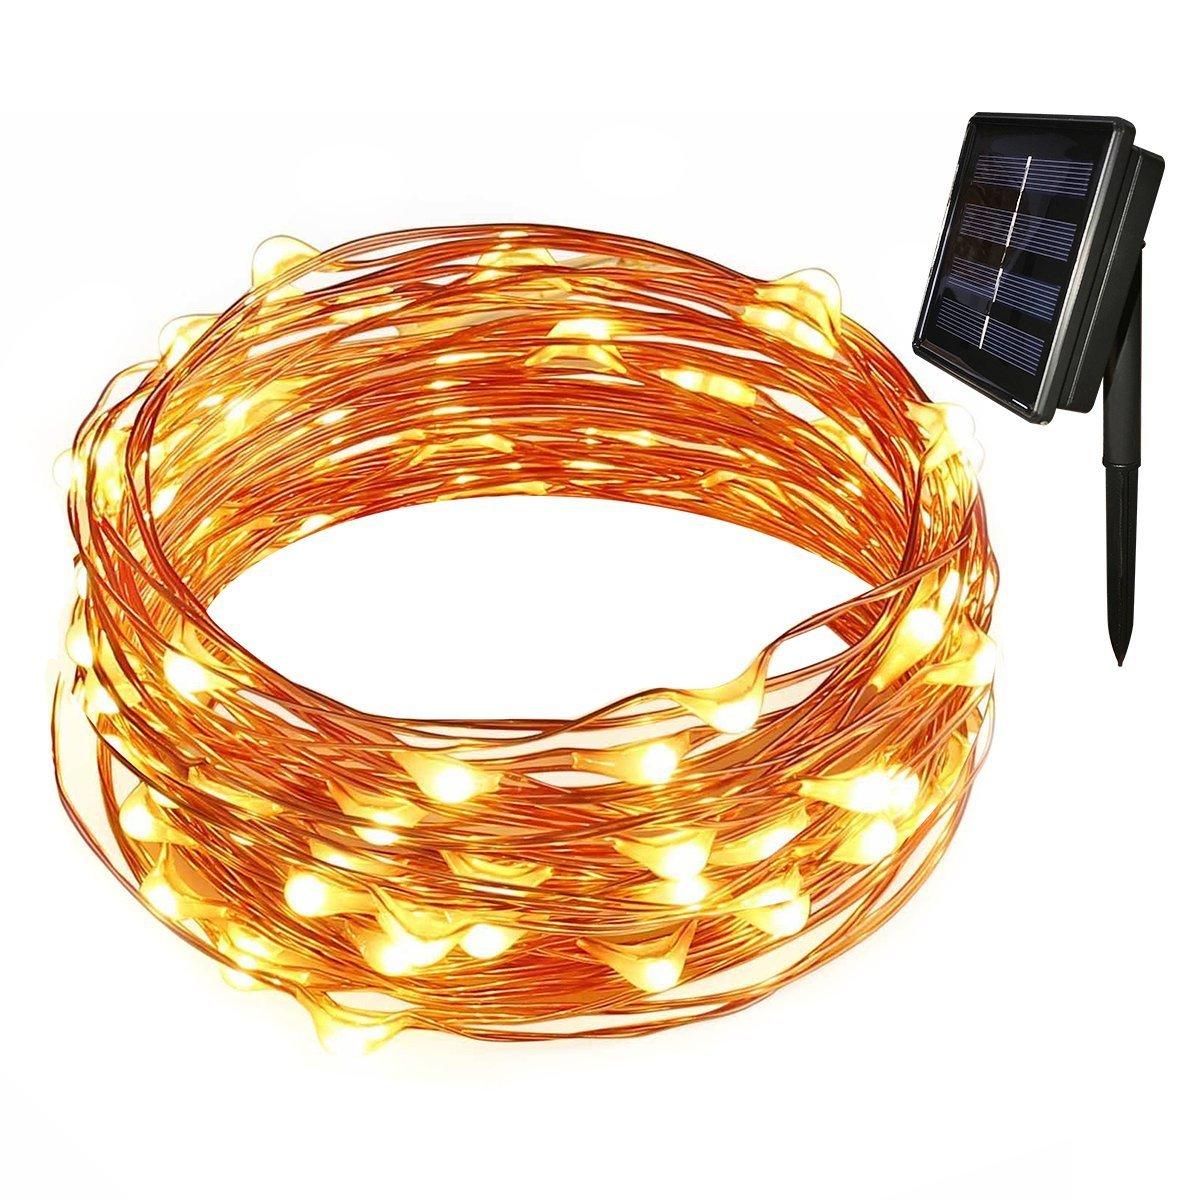 Tuokay 12M Cadena de Luces de Alambre de Cobre 100 LED Luces Solares Impermeable para Jardín, Terraza, Patio, Boda, Fiesta, Navidad (Blanco Calido) [Clase de eficiencia energética A+++]